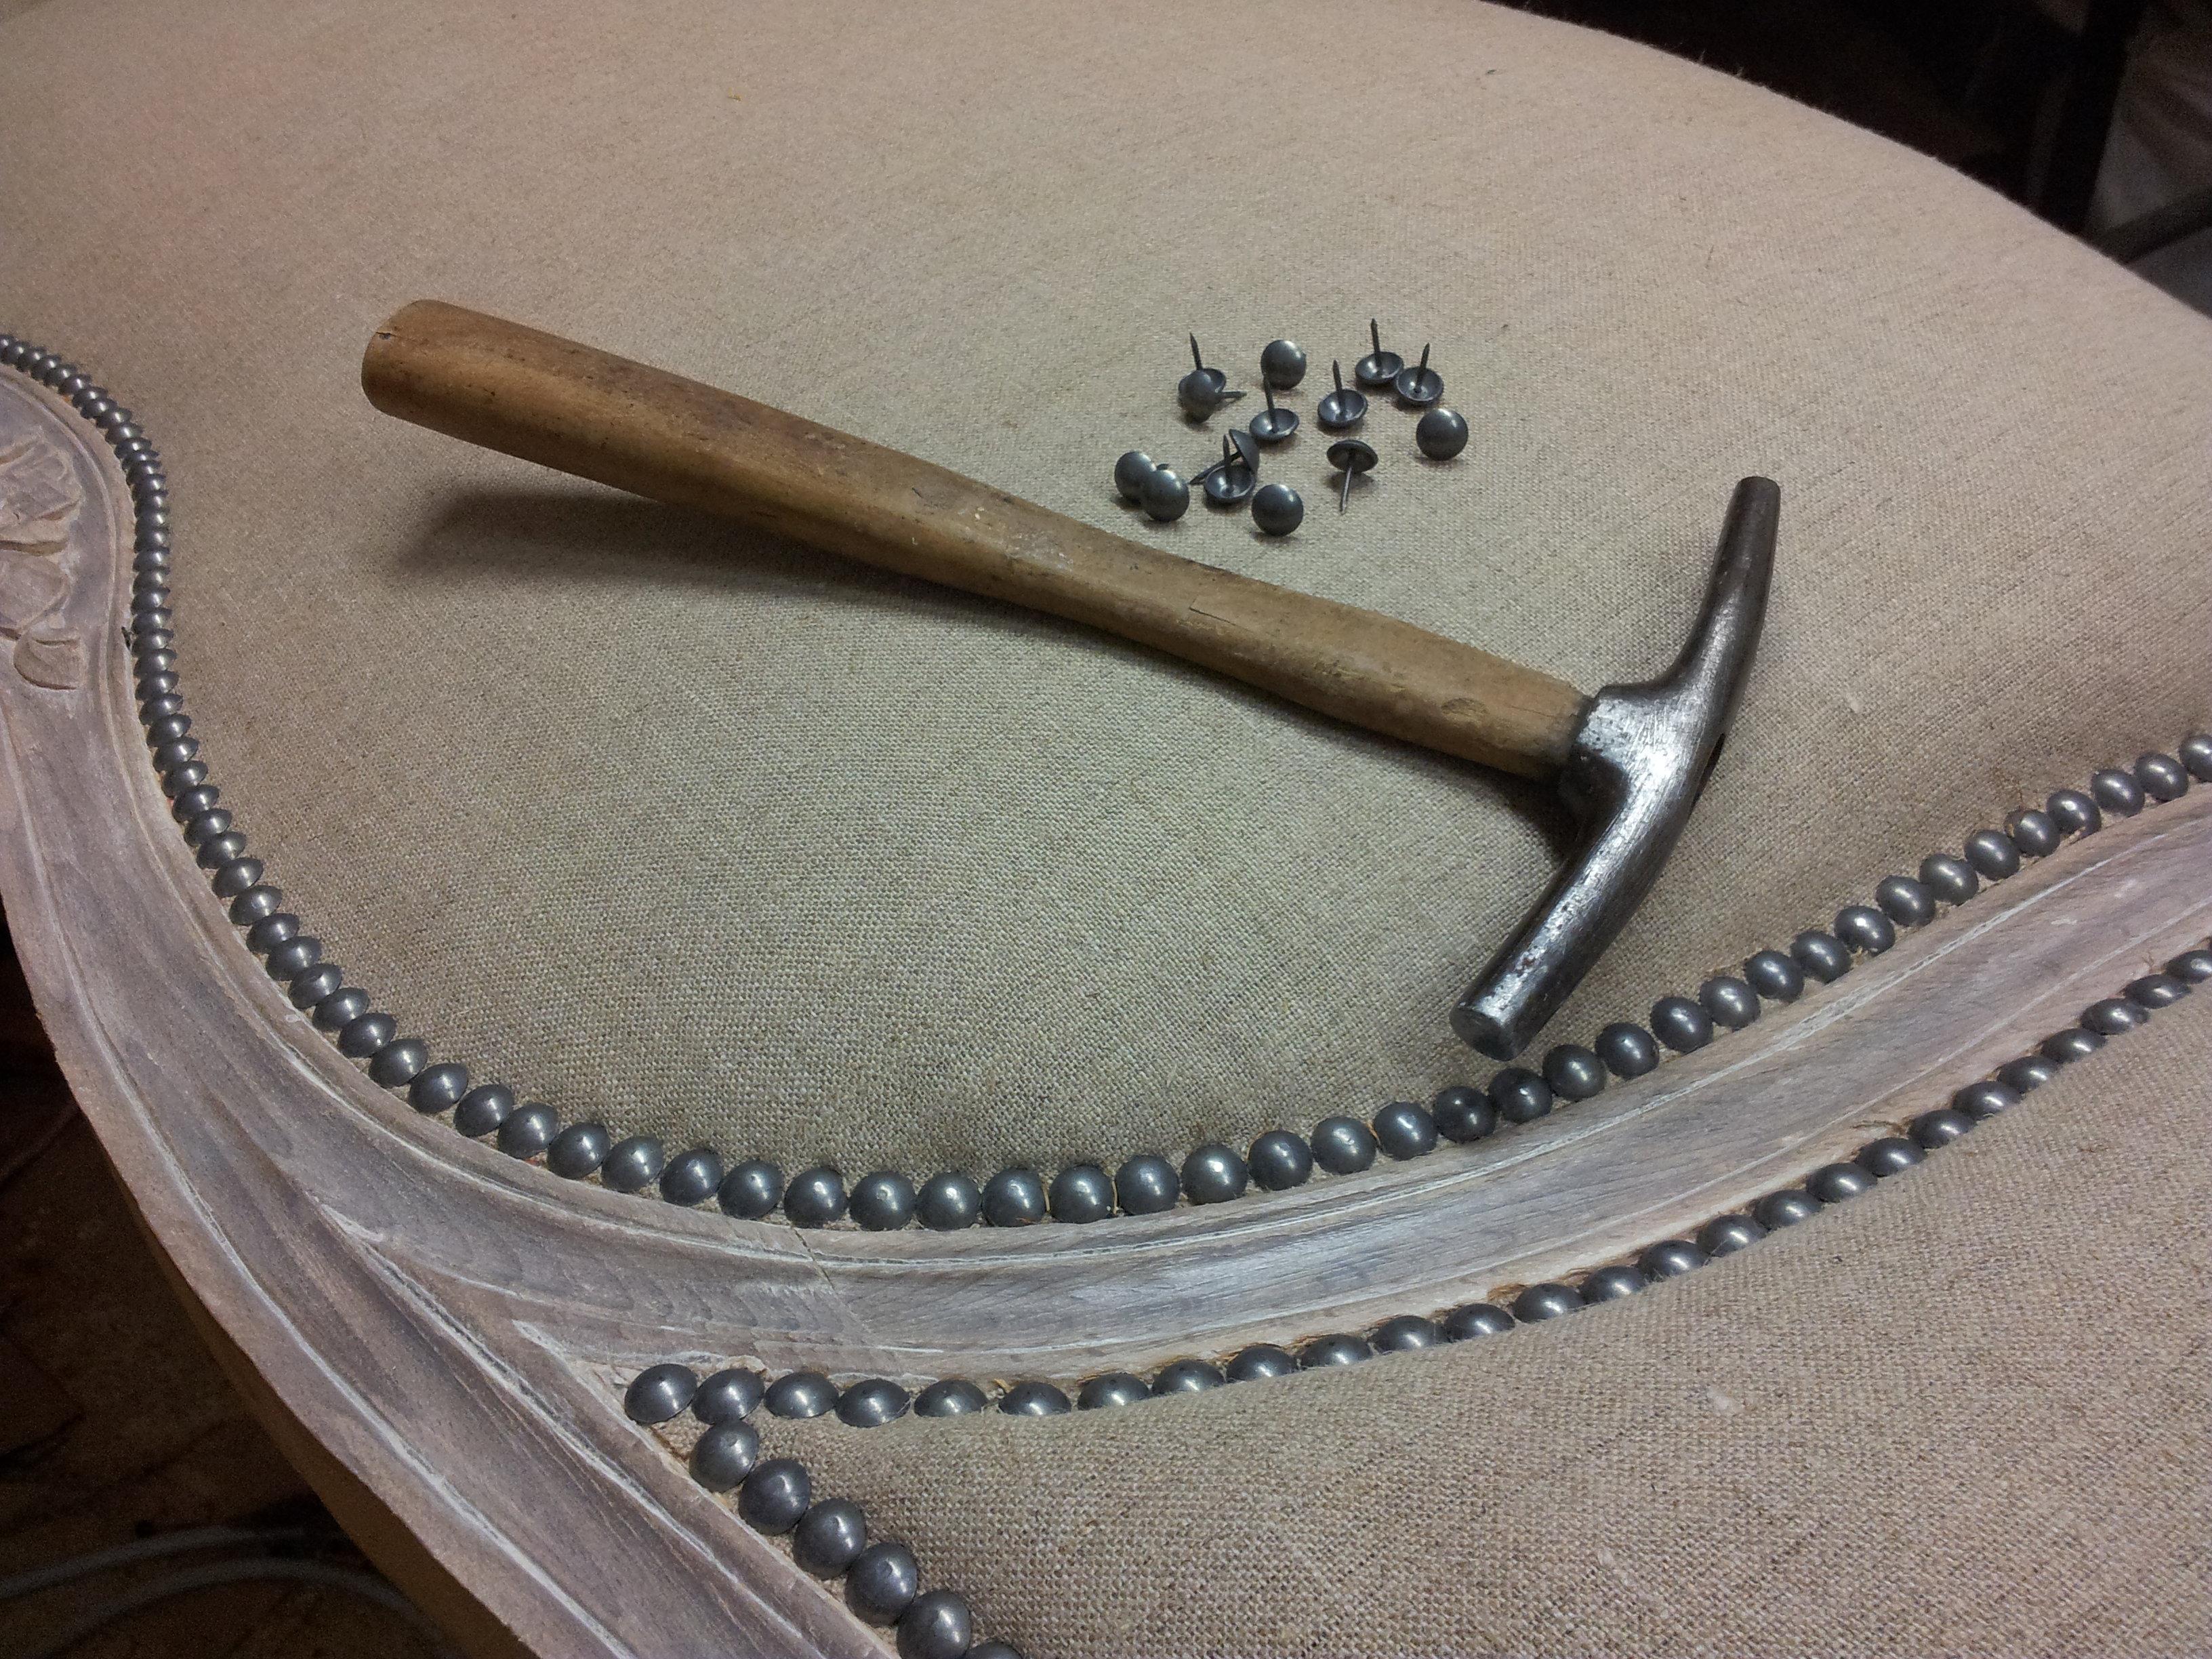 dco design tapissier decorateur clou tapissier tain. Black Bedroom Furniture Sets. Home Design Ideas